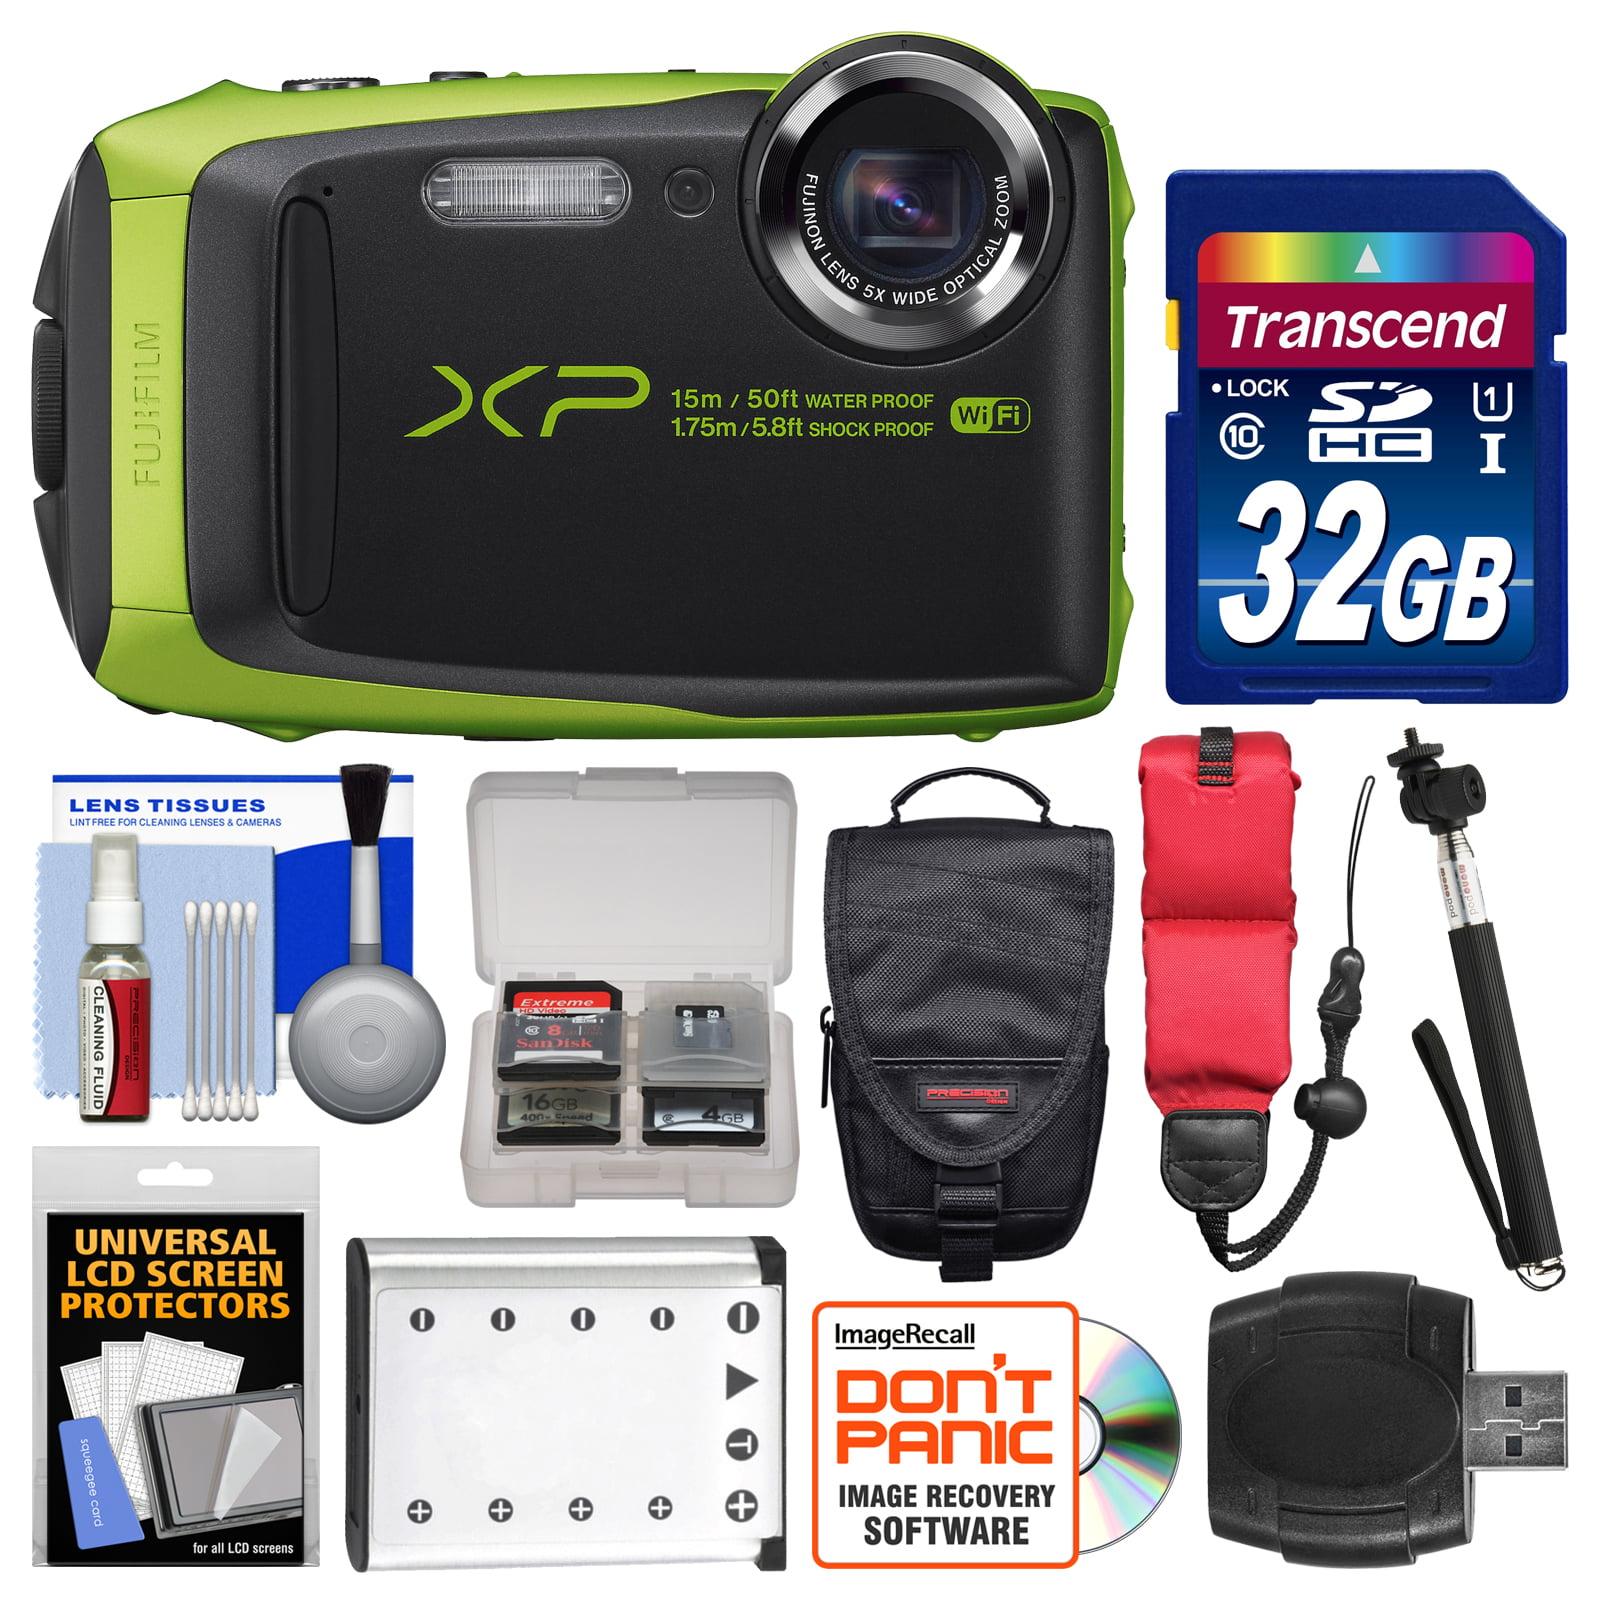 Fujifilm FinePix XP90 Shock & Waterproof Wi-Fi Digital Camera (Black/Lime Green) with 32GB Card + Case + Battery + Selfie Stick + Float Strap + Kit